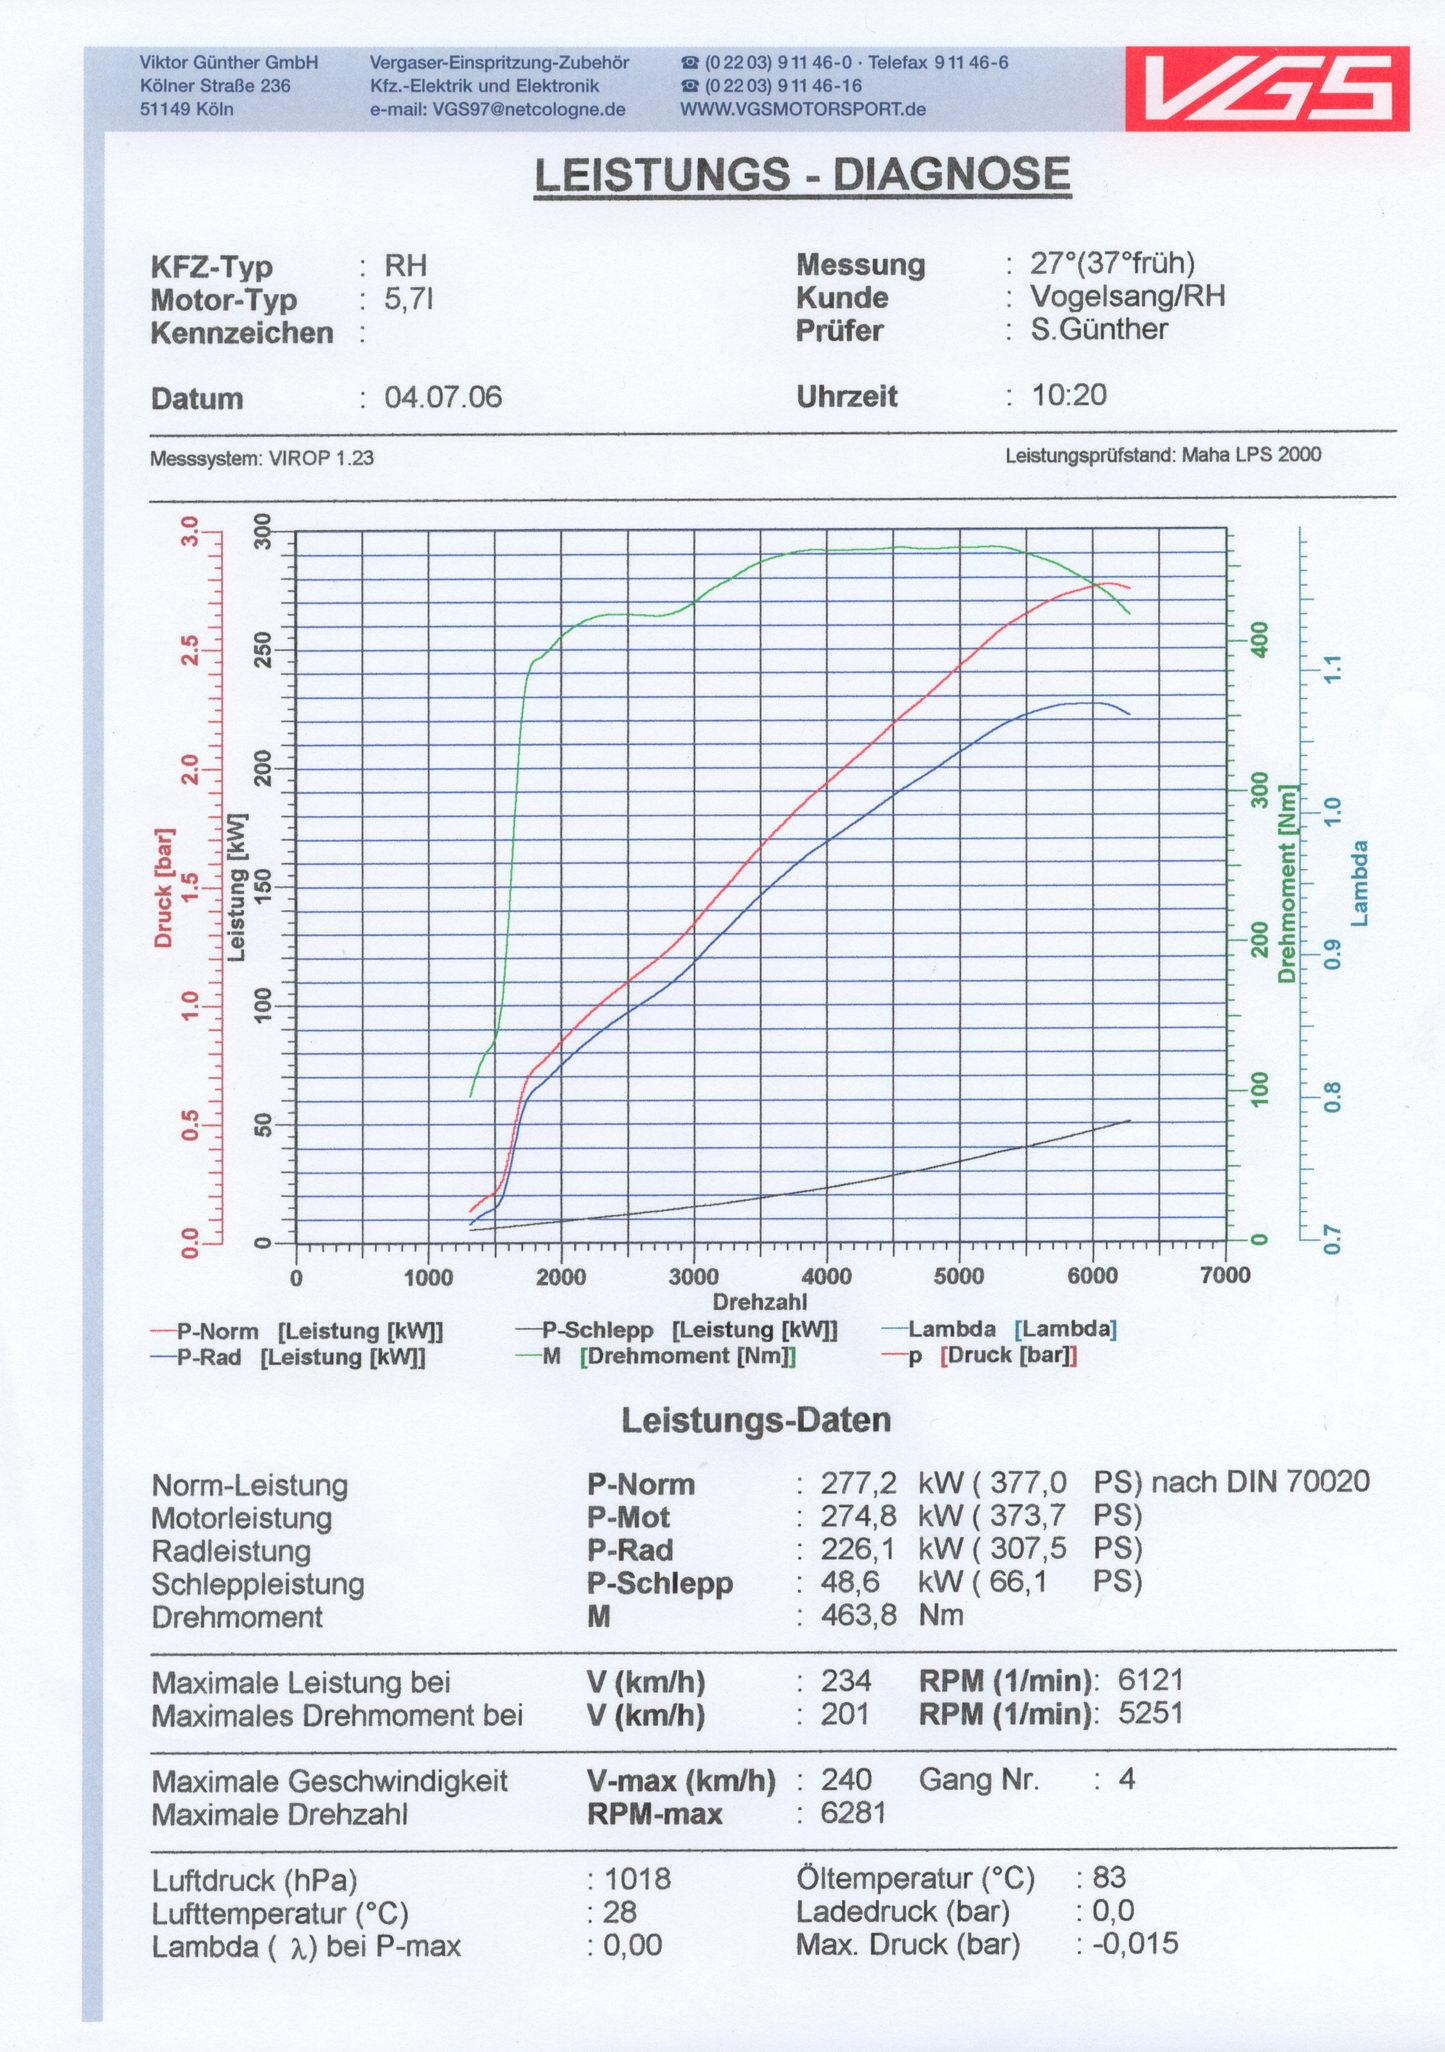 Acp American Cars Parts L98 Engine Diagram Rh Rapsody Motor Mit Genderter Nockenwelle 377 Ps Bei 6121 U Min 4638 Nm 5251 Weitere Info Siehe Diagramm